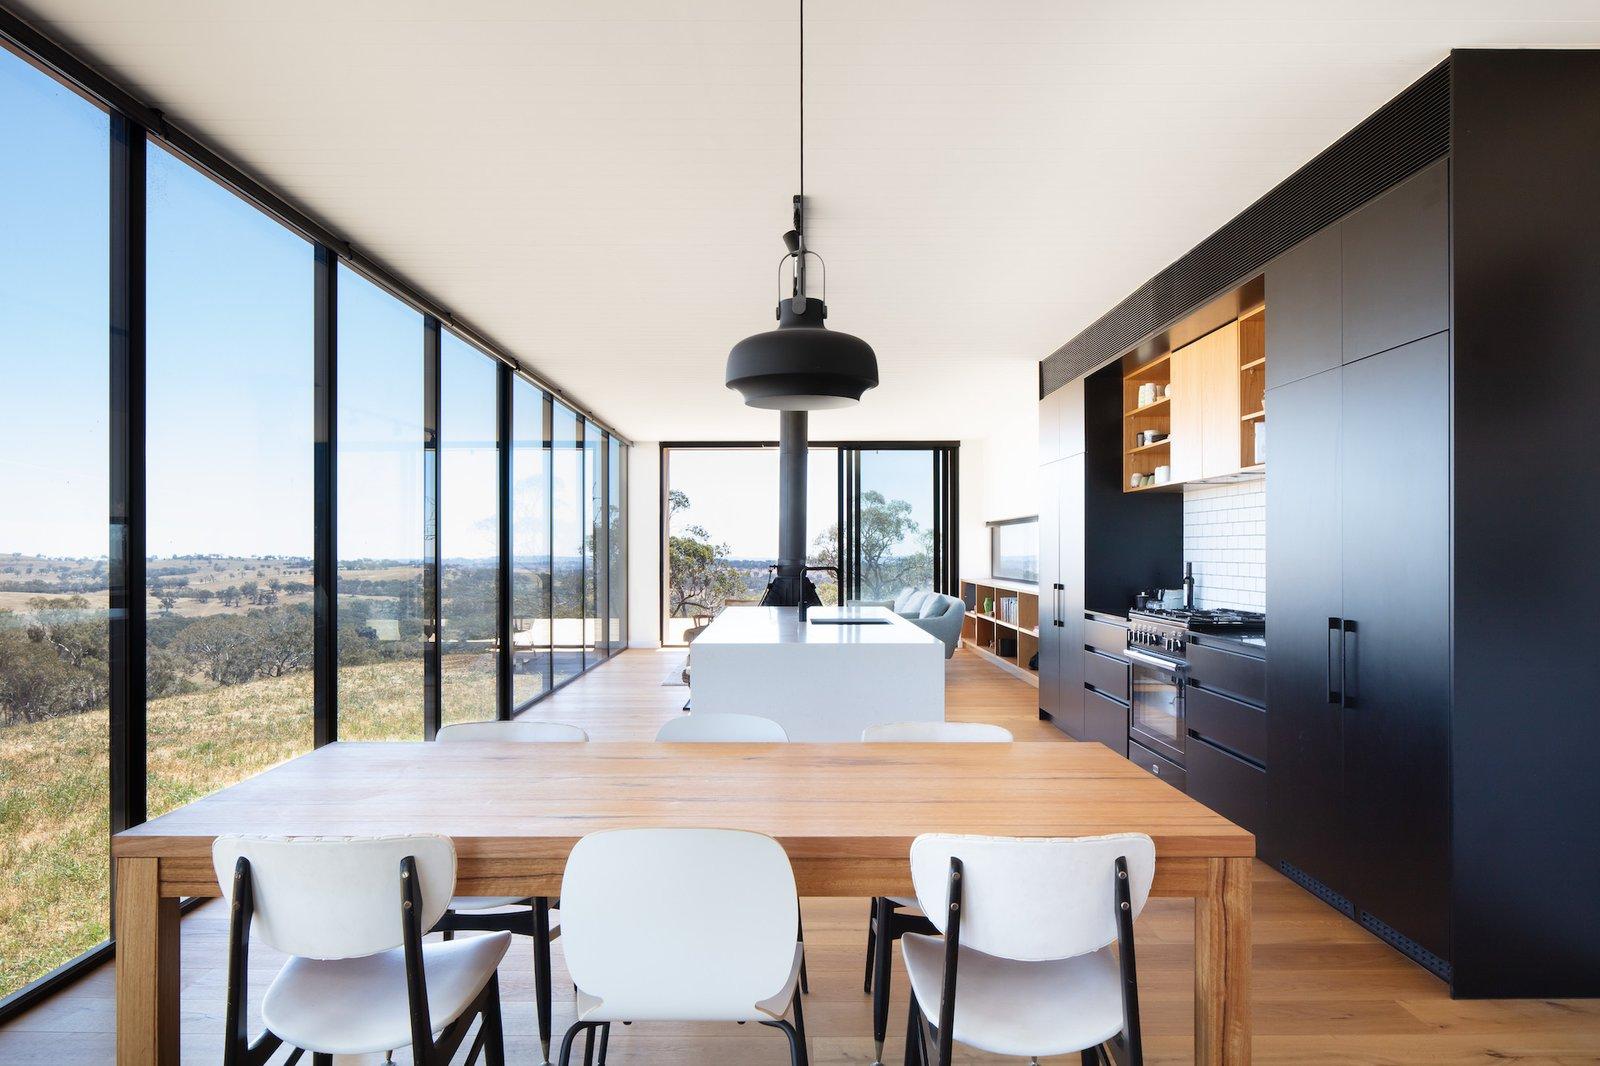 Kitchen at Kangaroobie by Modscape.